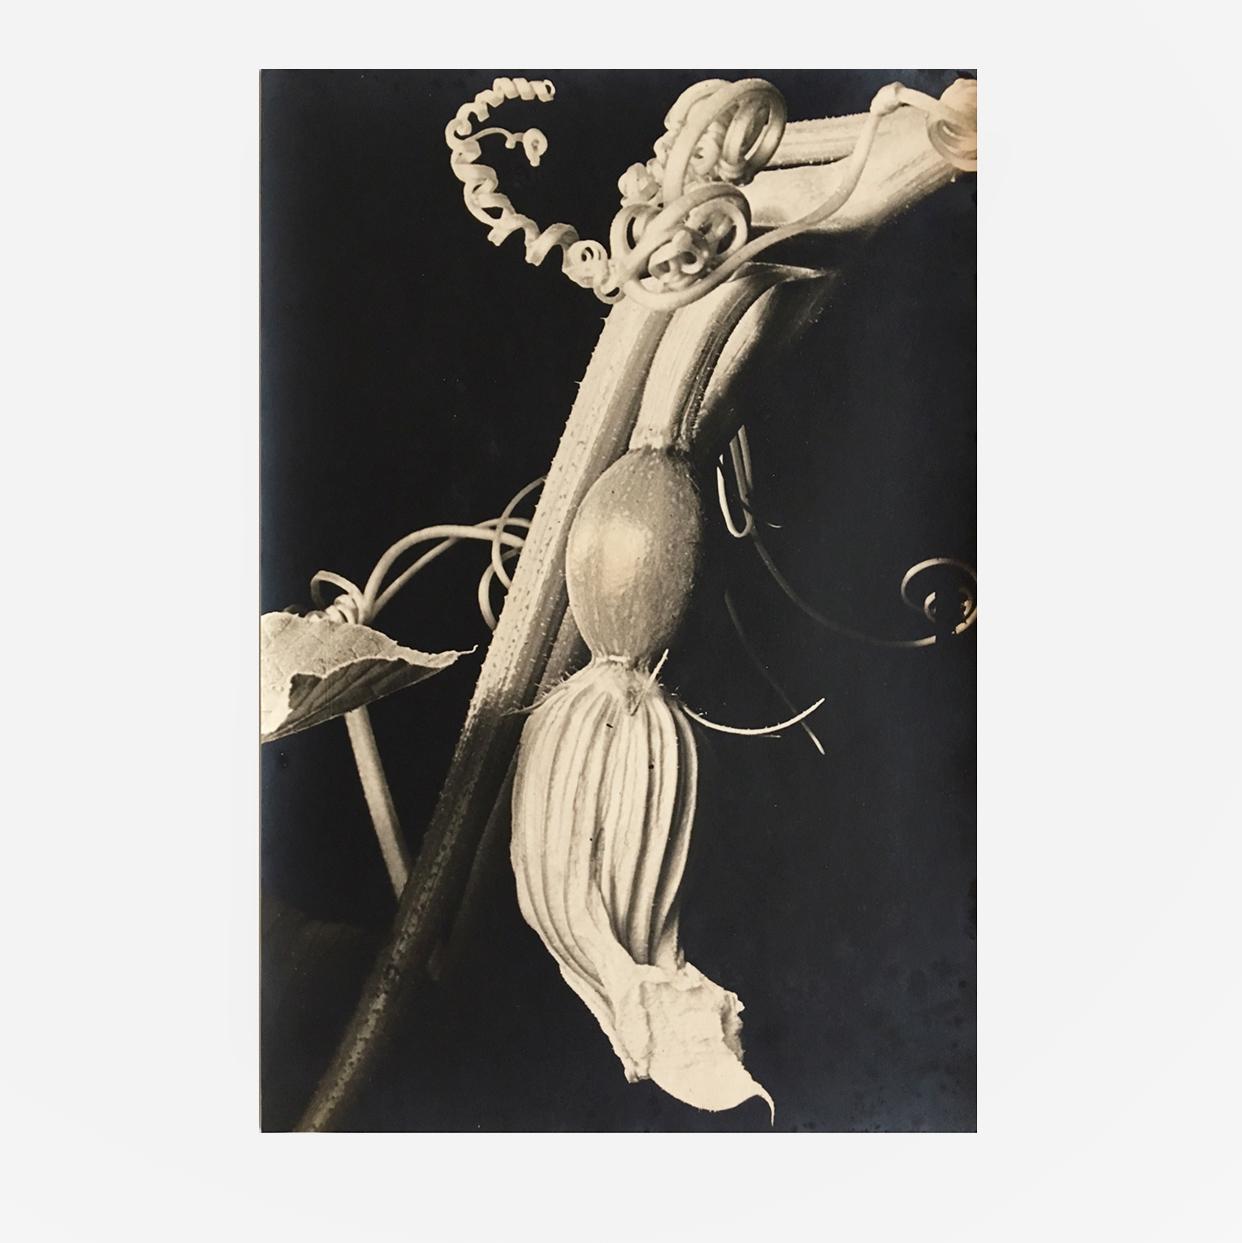 Dr. Paul Wolff & Alfred Tritschler | Zucchiniblüte |Photography, silver gelatin print | Germany | 1931 | basedonart gallery